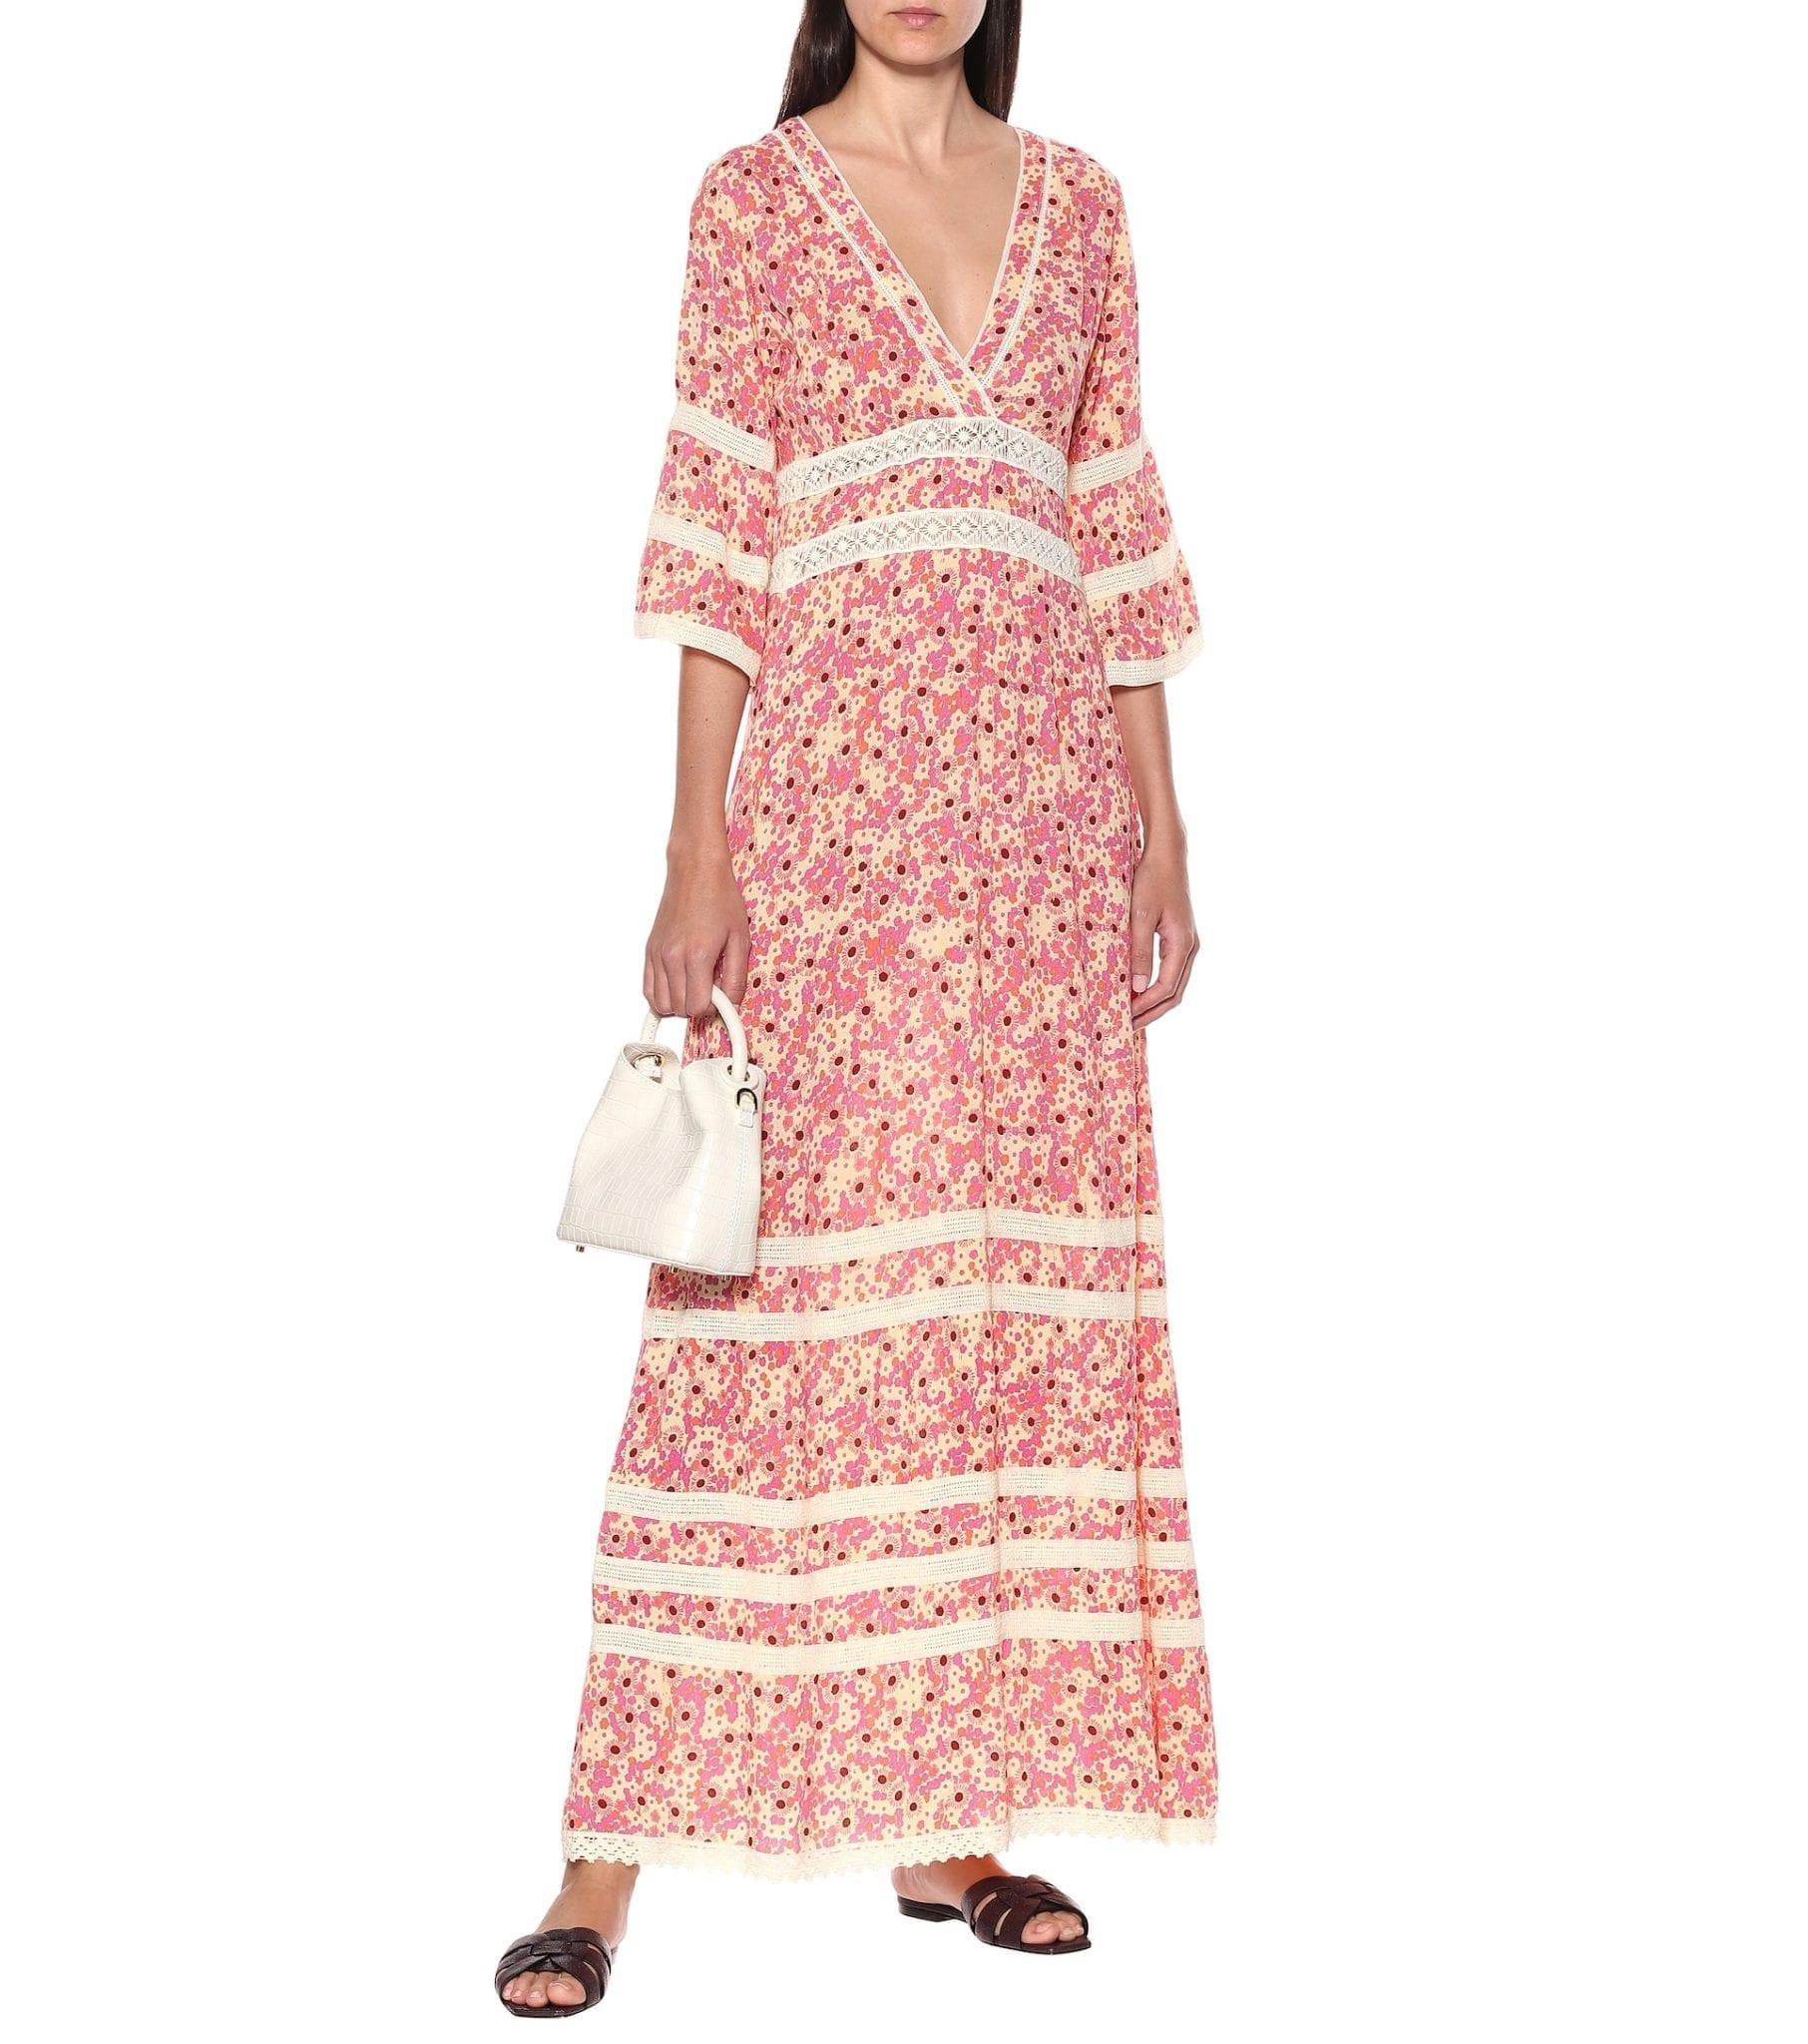 POUPETTE ST BARTH Capri Floral Crêpe Dress